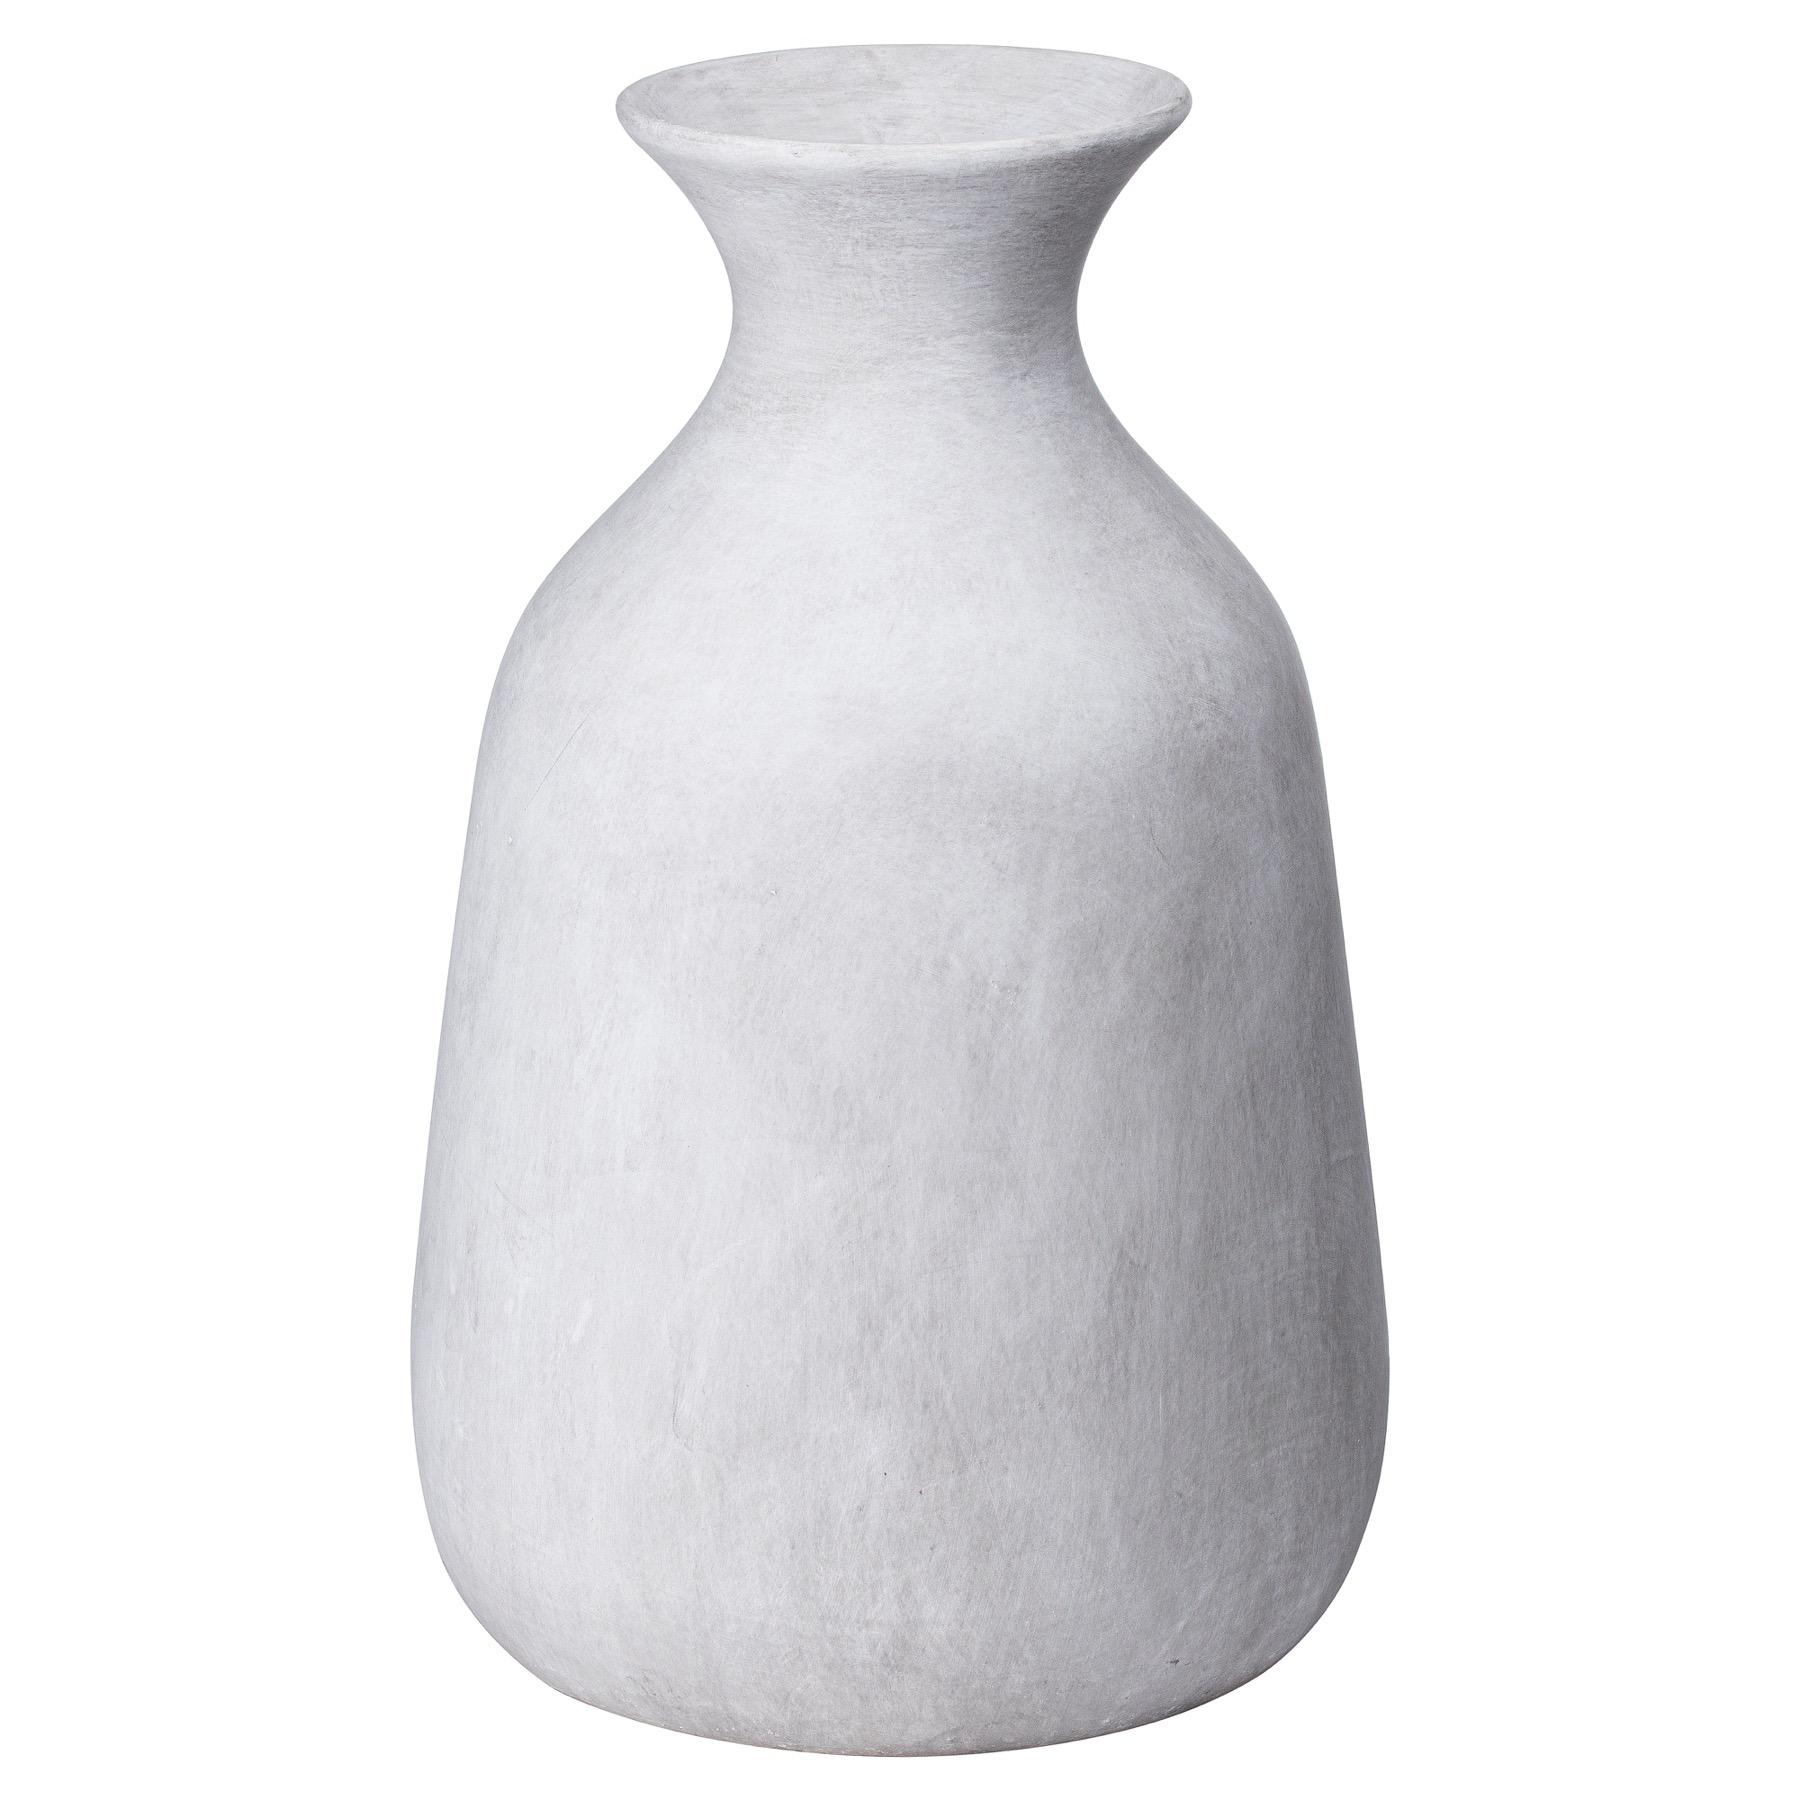 Darcy Ople Stone Vase - Image 1